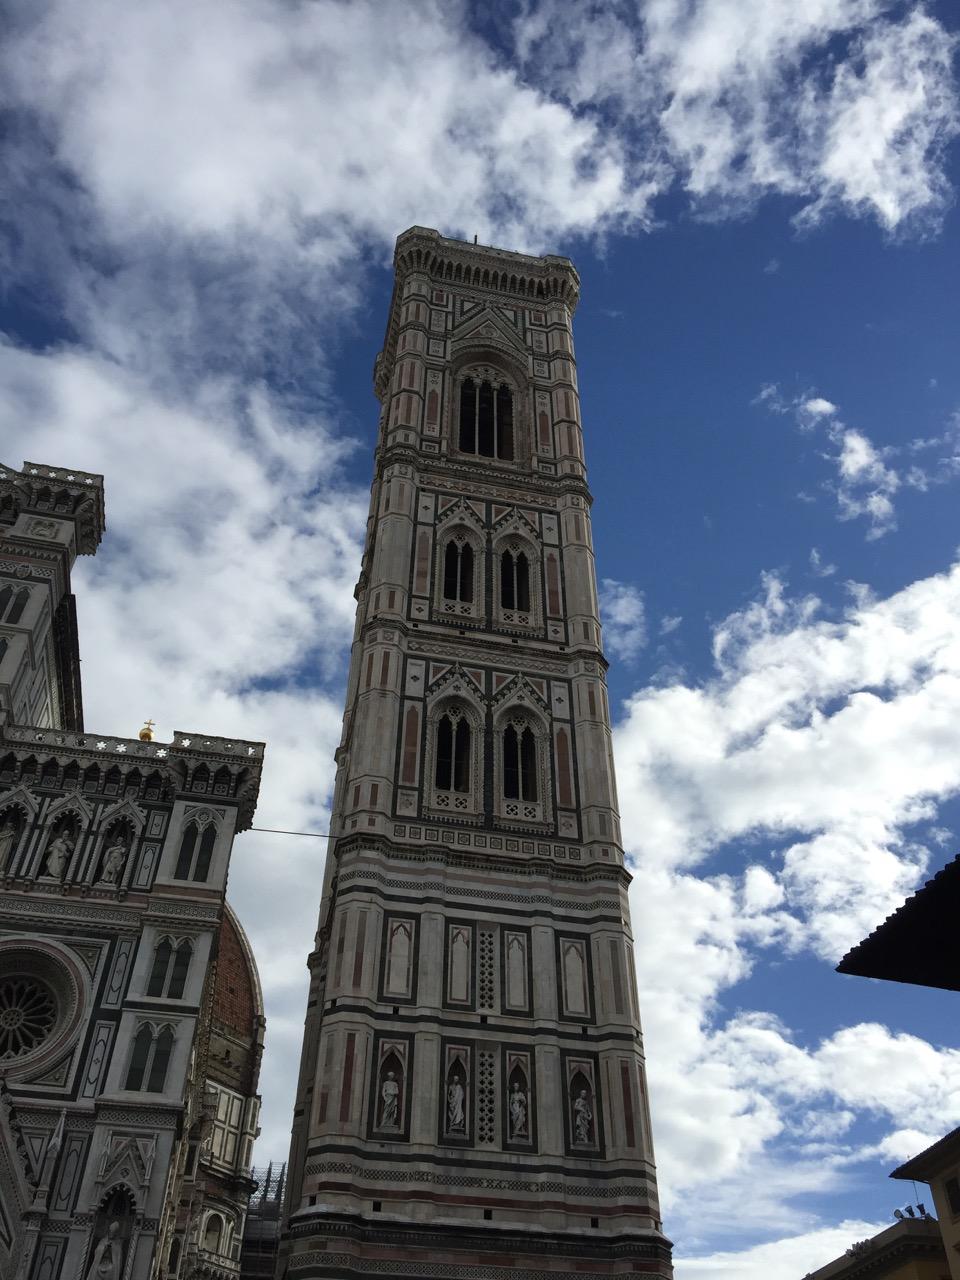 Der Campanile - Glockenturm